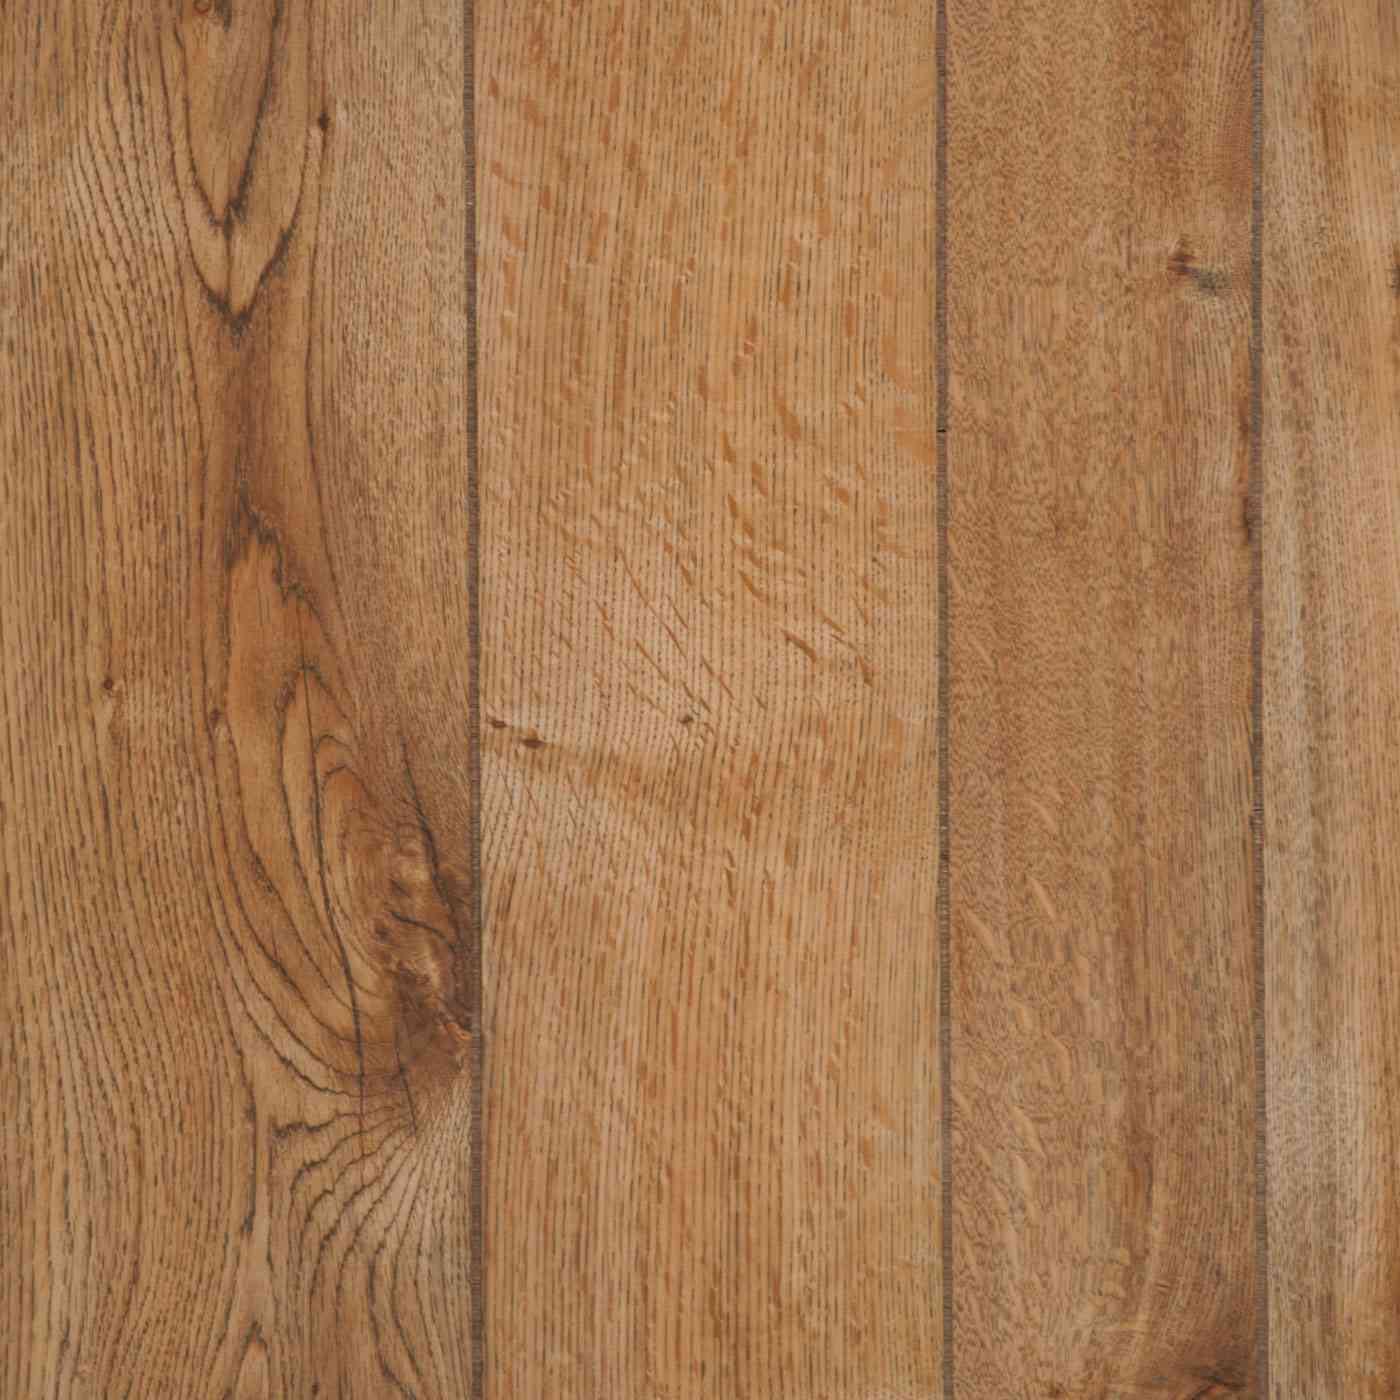 Gala Oak Plank Paneling | 9-groove